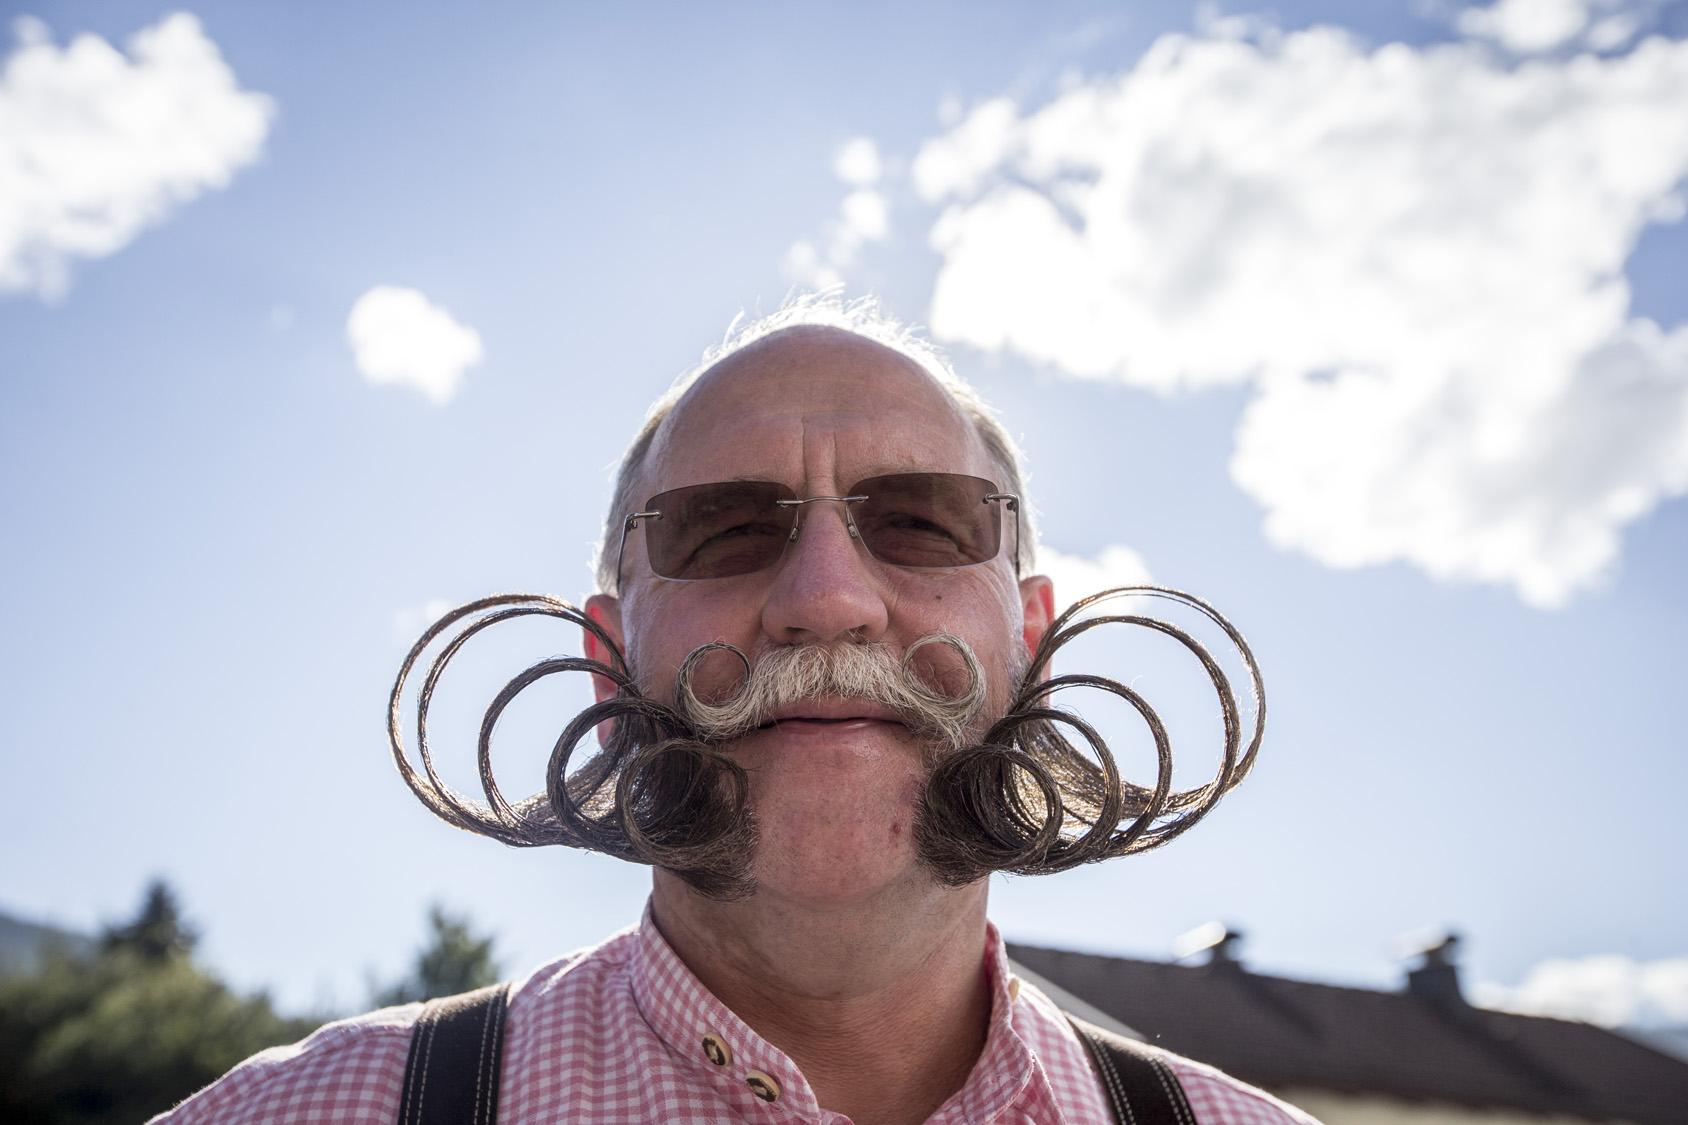 Mobius moustache